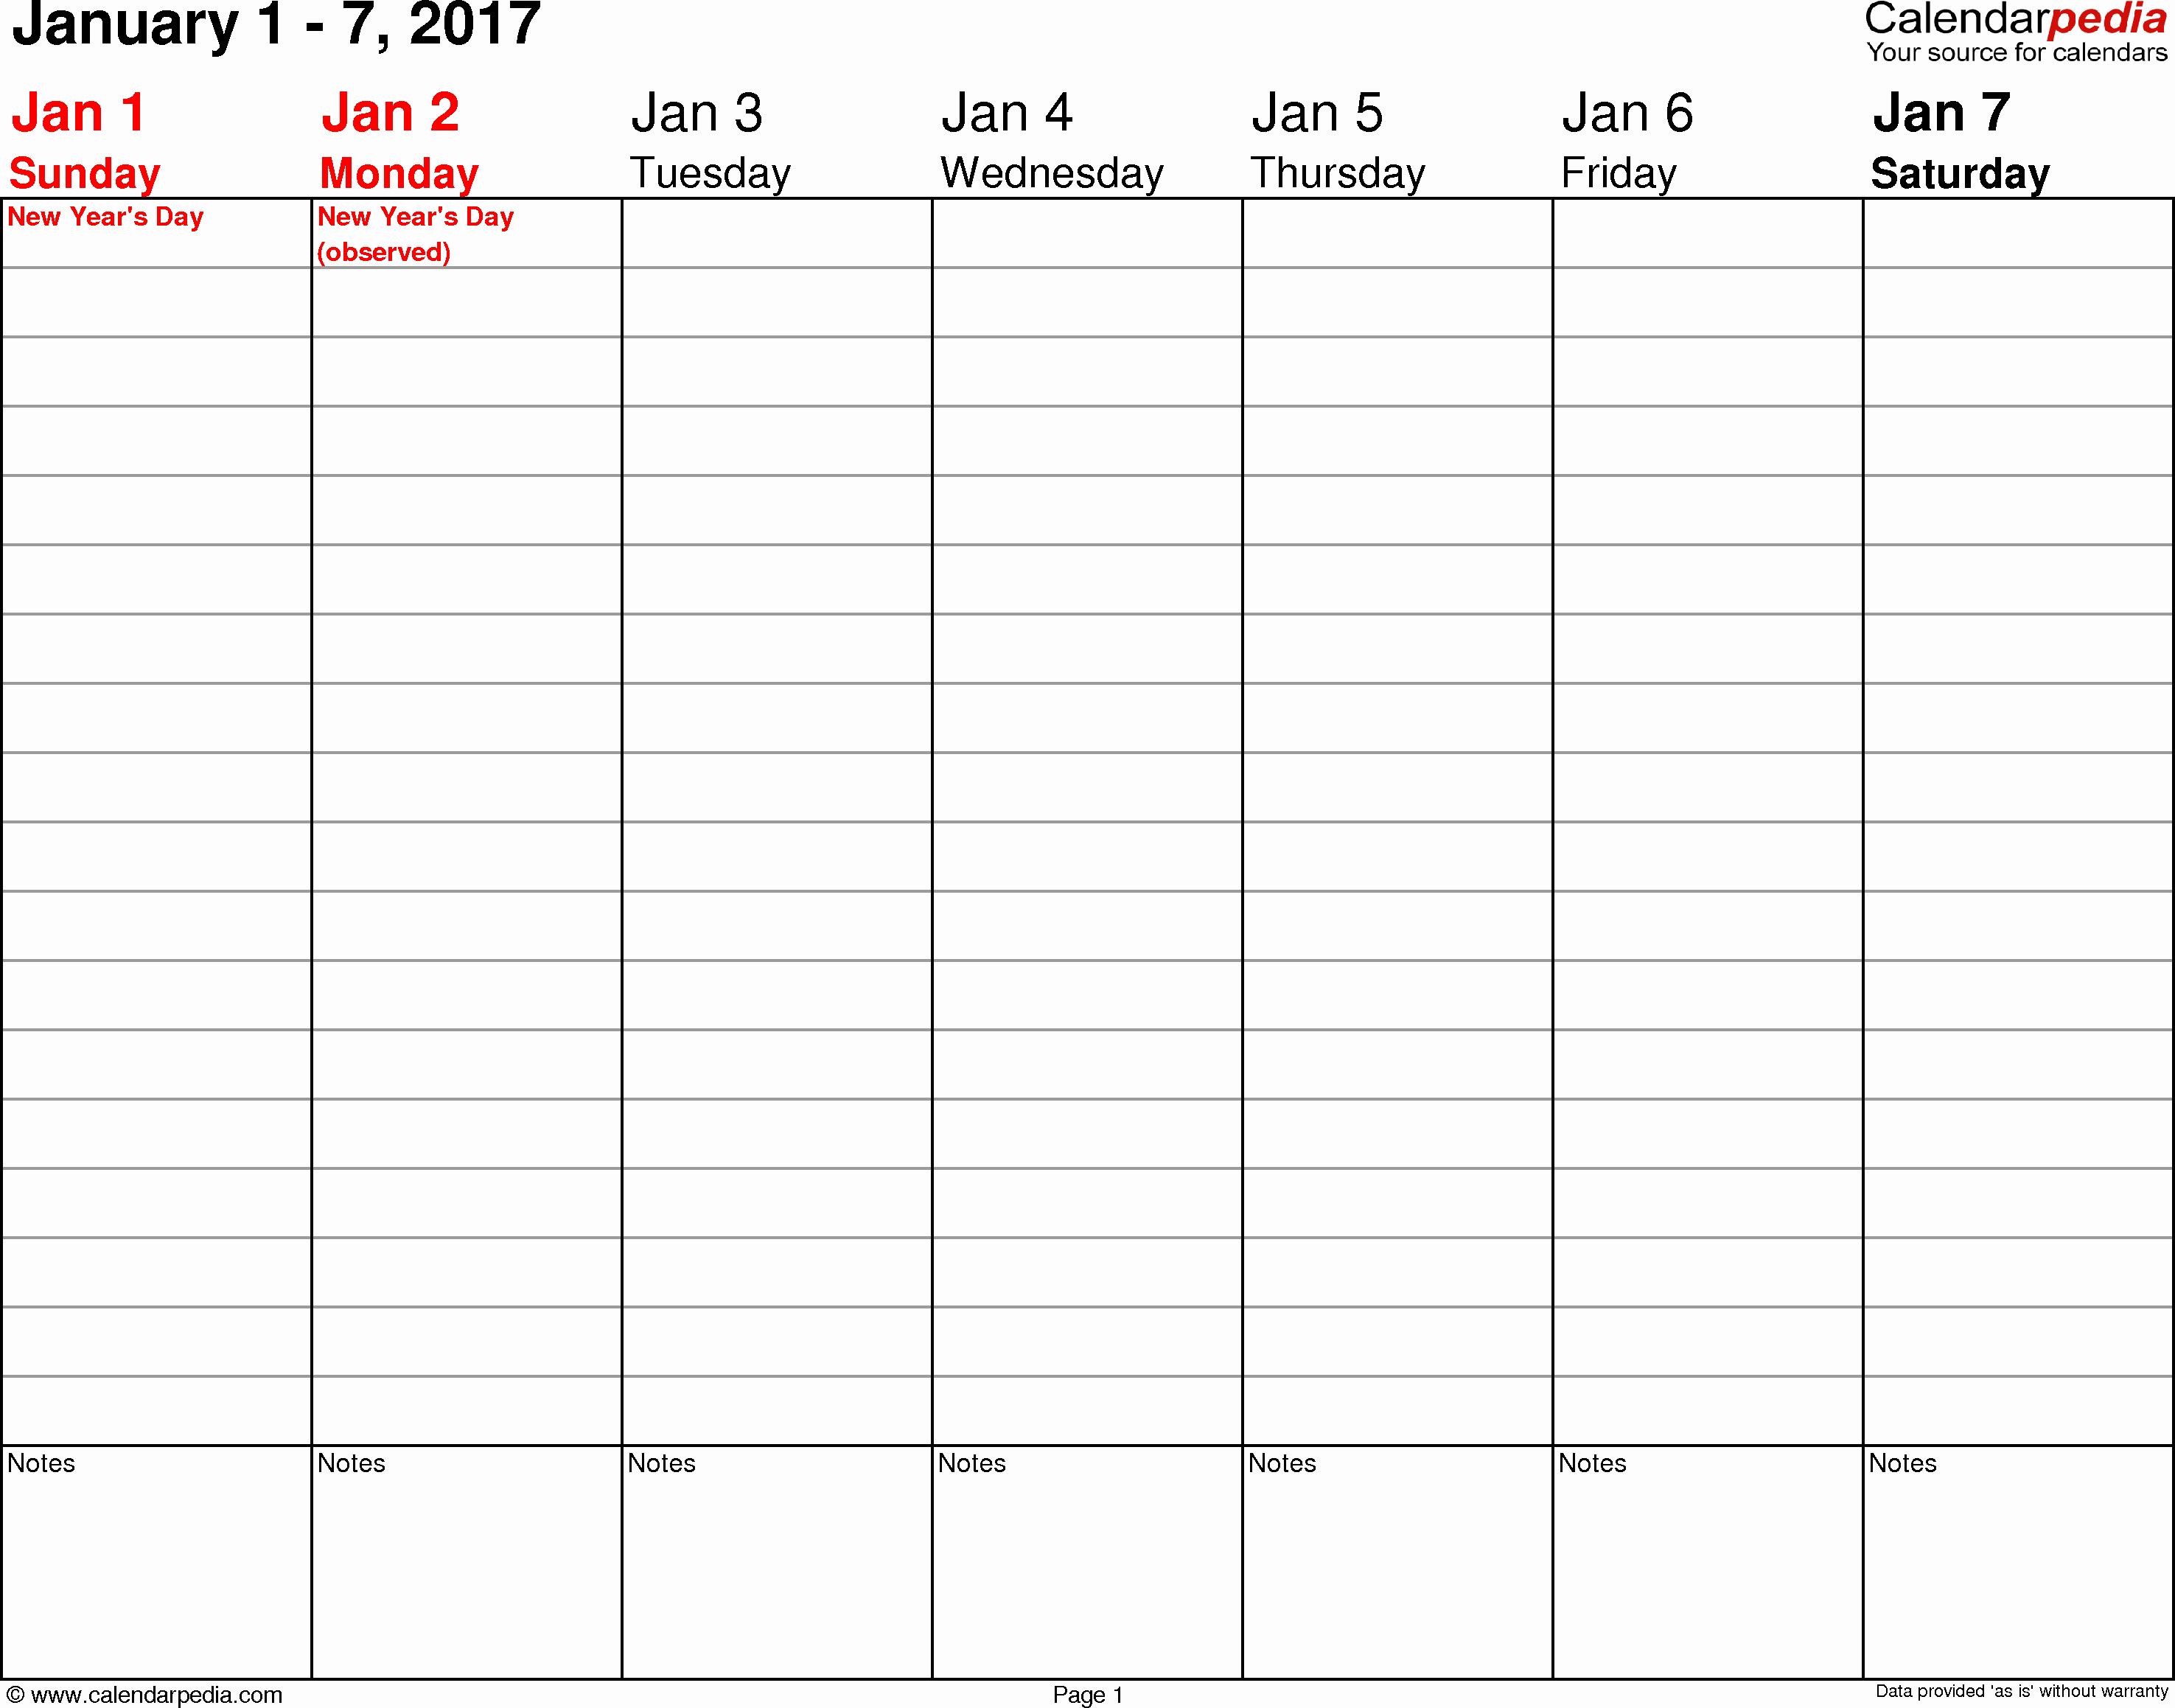 Weekly Calendar Template 2017 Inspirational Weekly Calendar 2017 for Pdf 12 Free Printable Templates